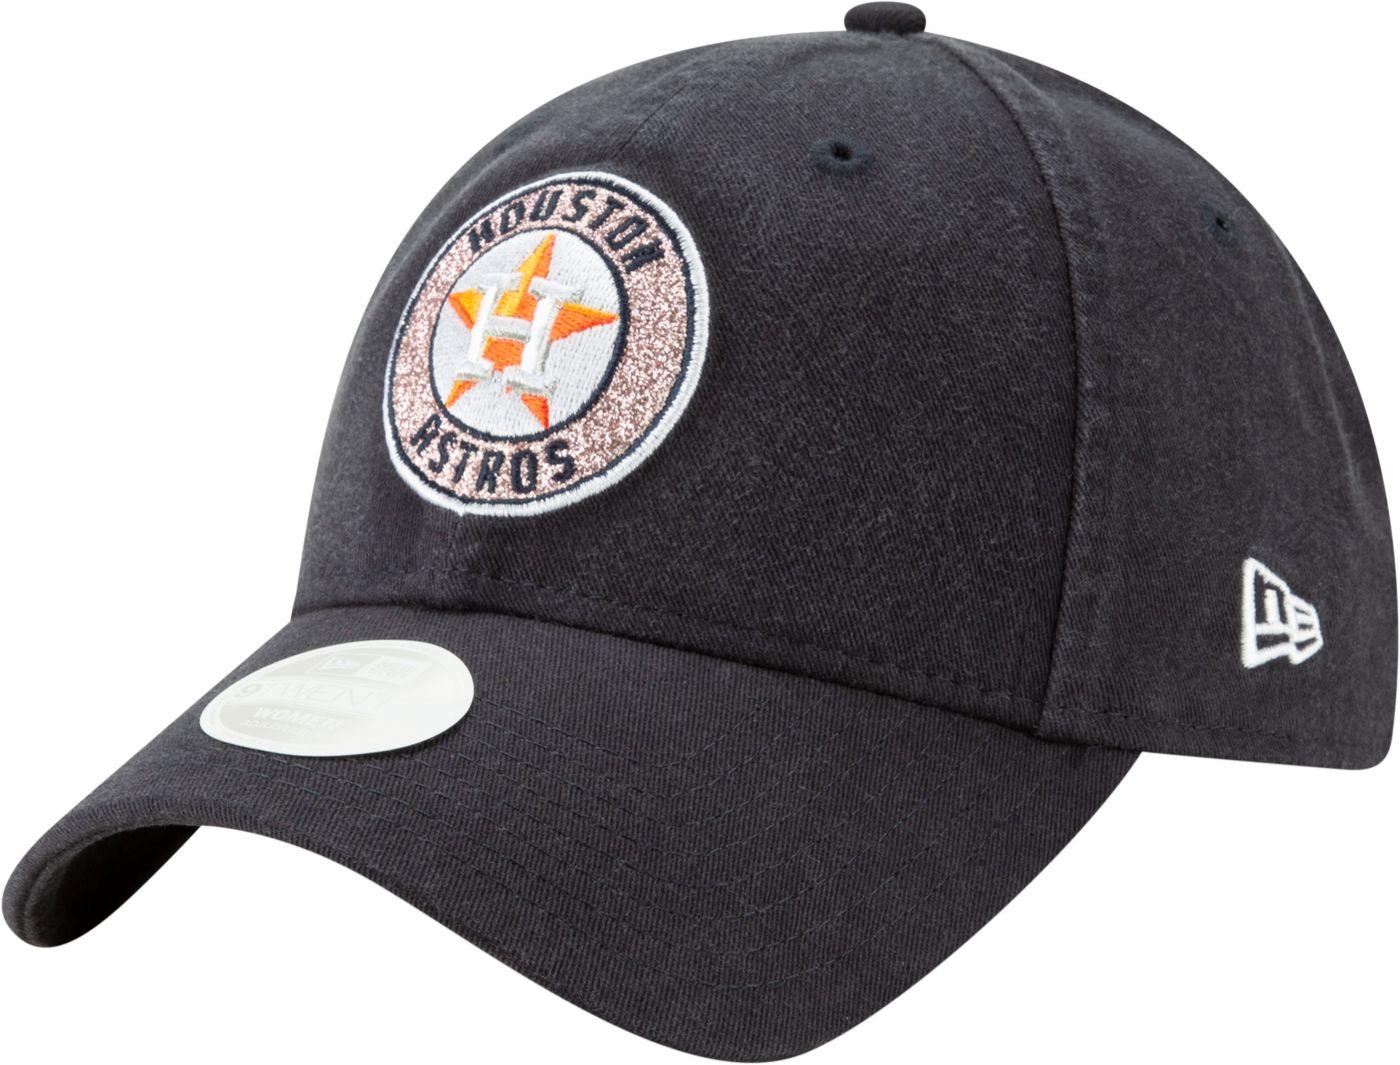 New Era Women's Houston Astros 9Twenty Patched Sparkle Adjustable Hat